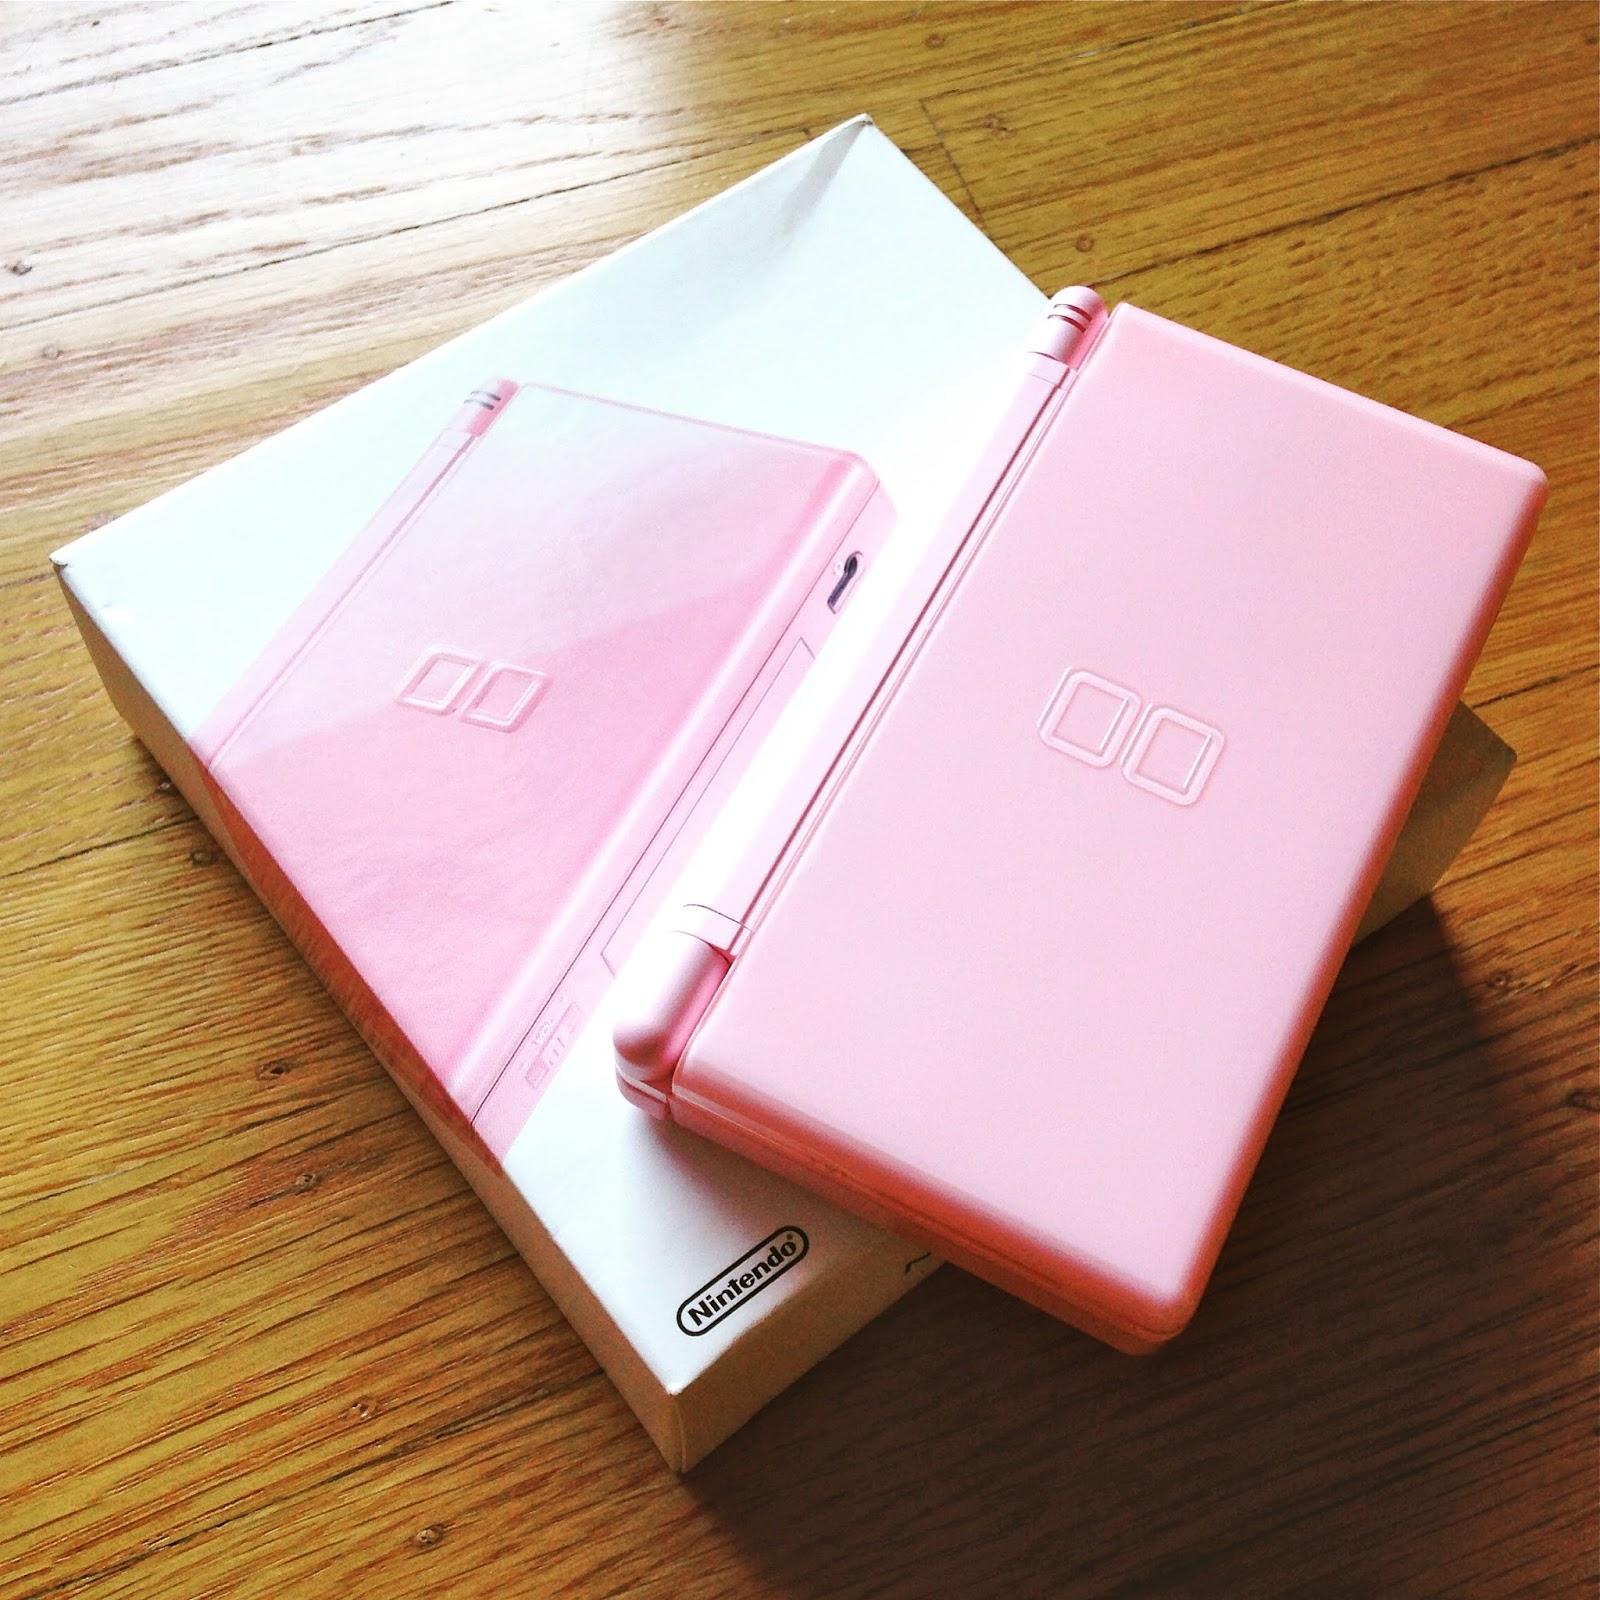 the gay gamer nice package 39 noble pink 39 nintendo ds lite. Black Bedroom Furniture Sets. Home Design Ideas